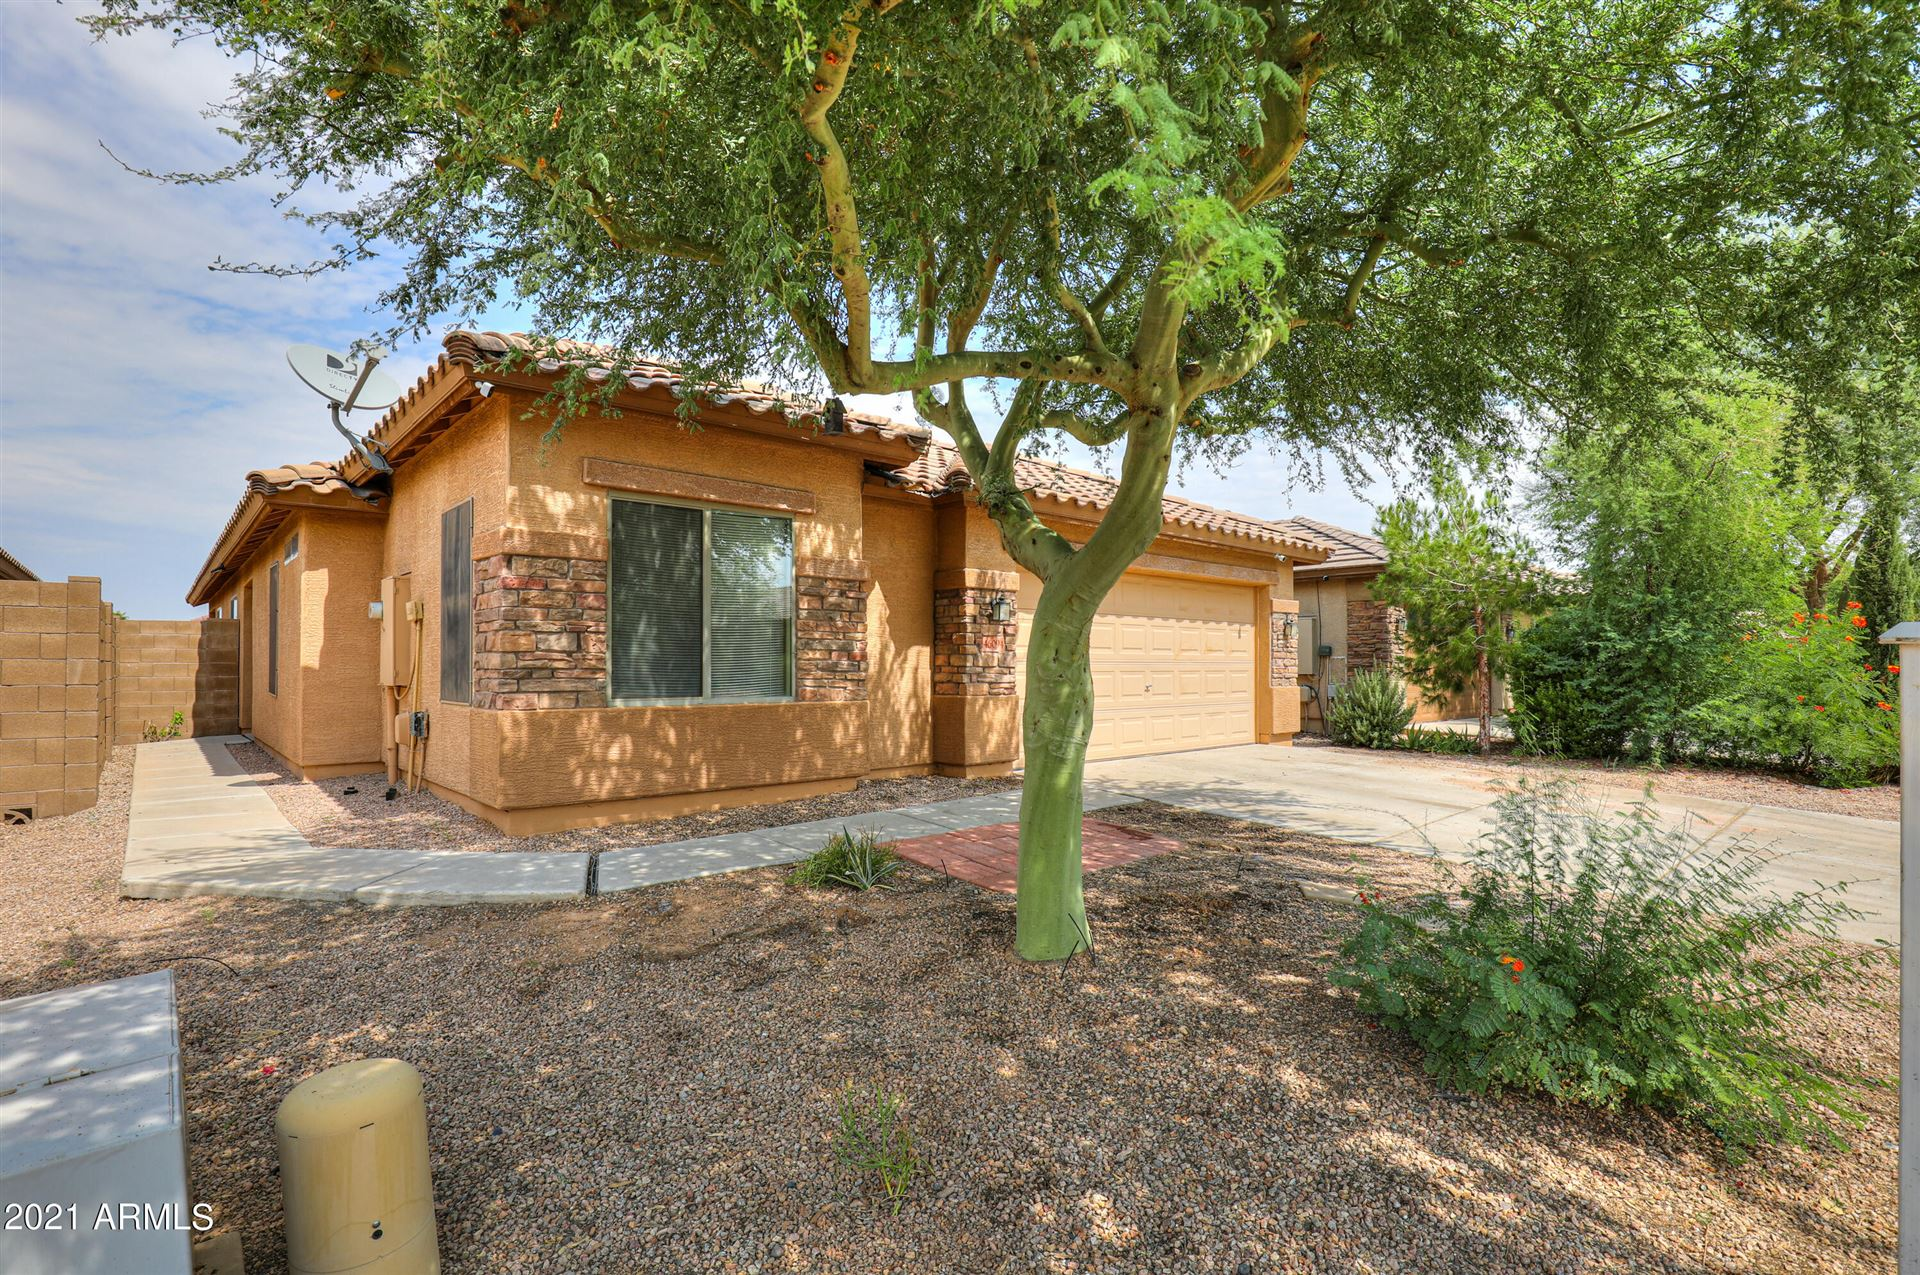 Photo of 46094 W STARLIGHT Drive, Maricopa, AZ 85139 (MLS # 6293374)